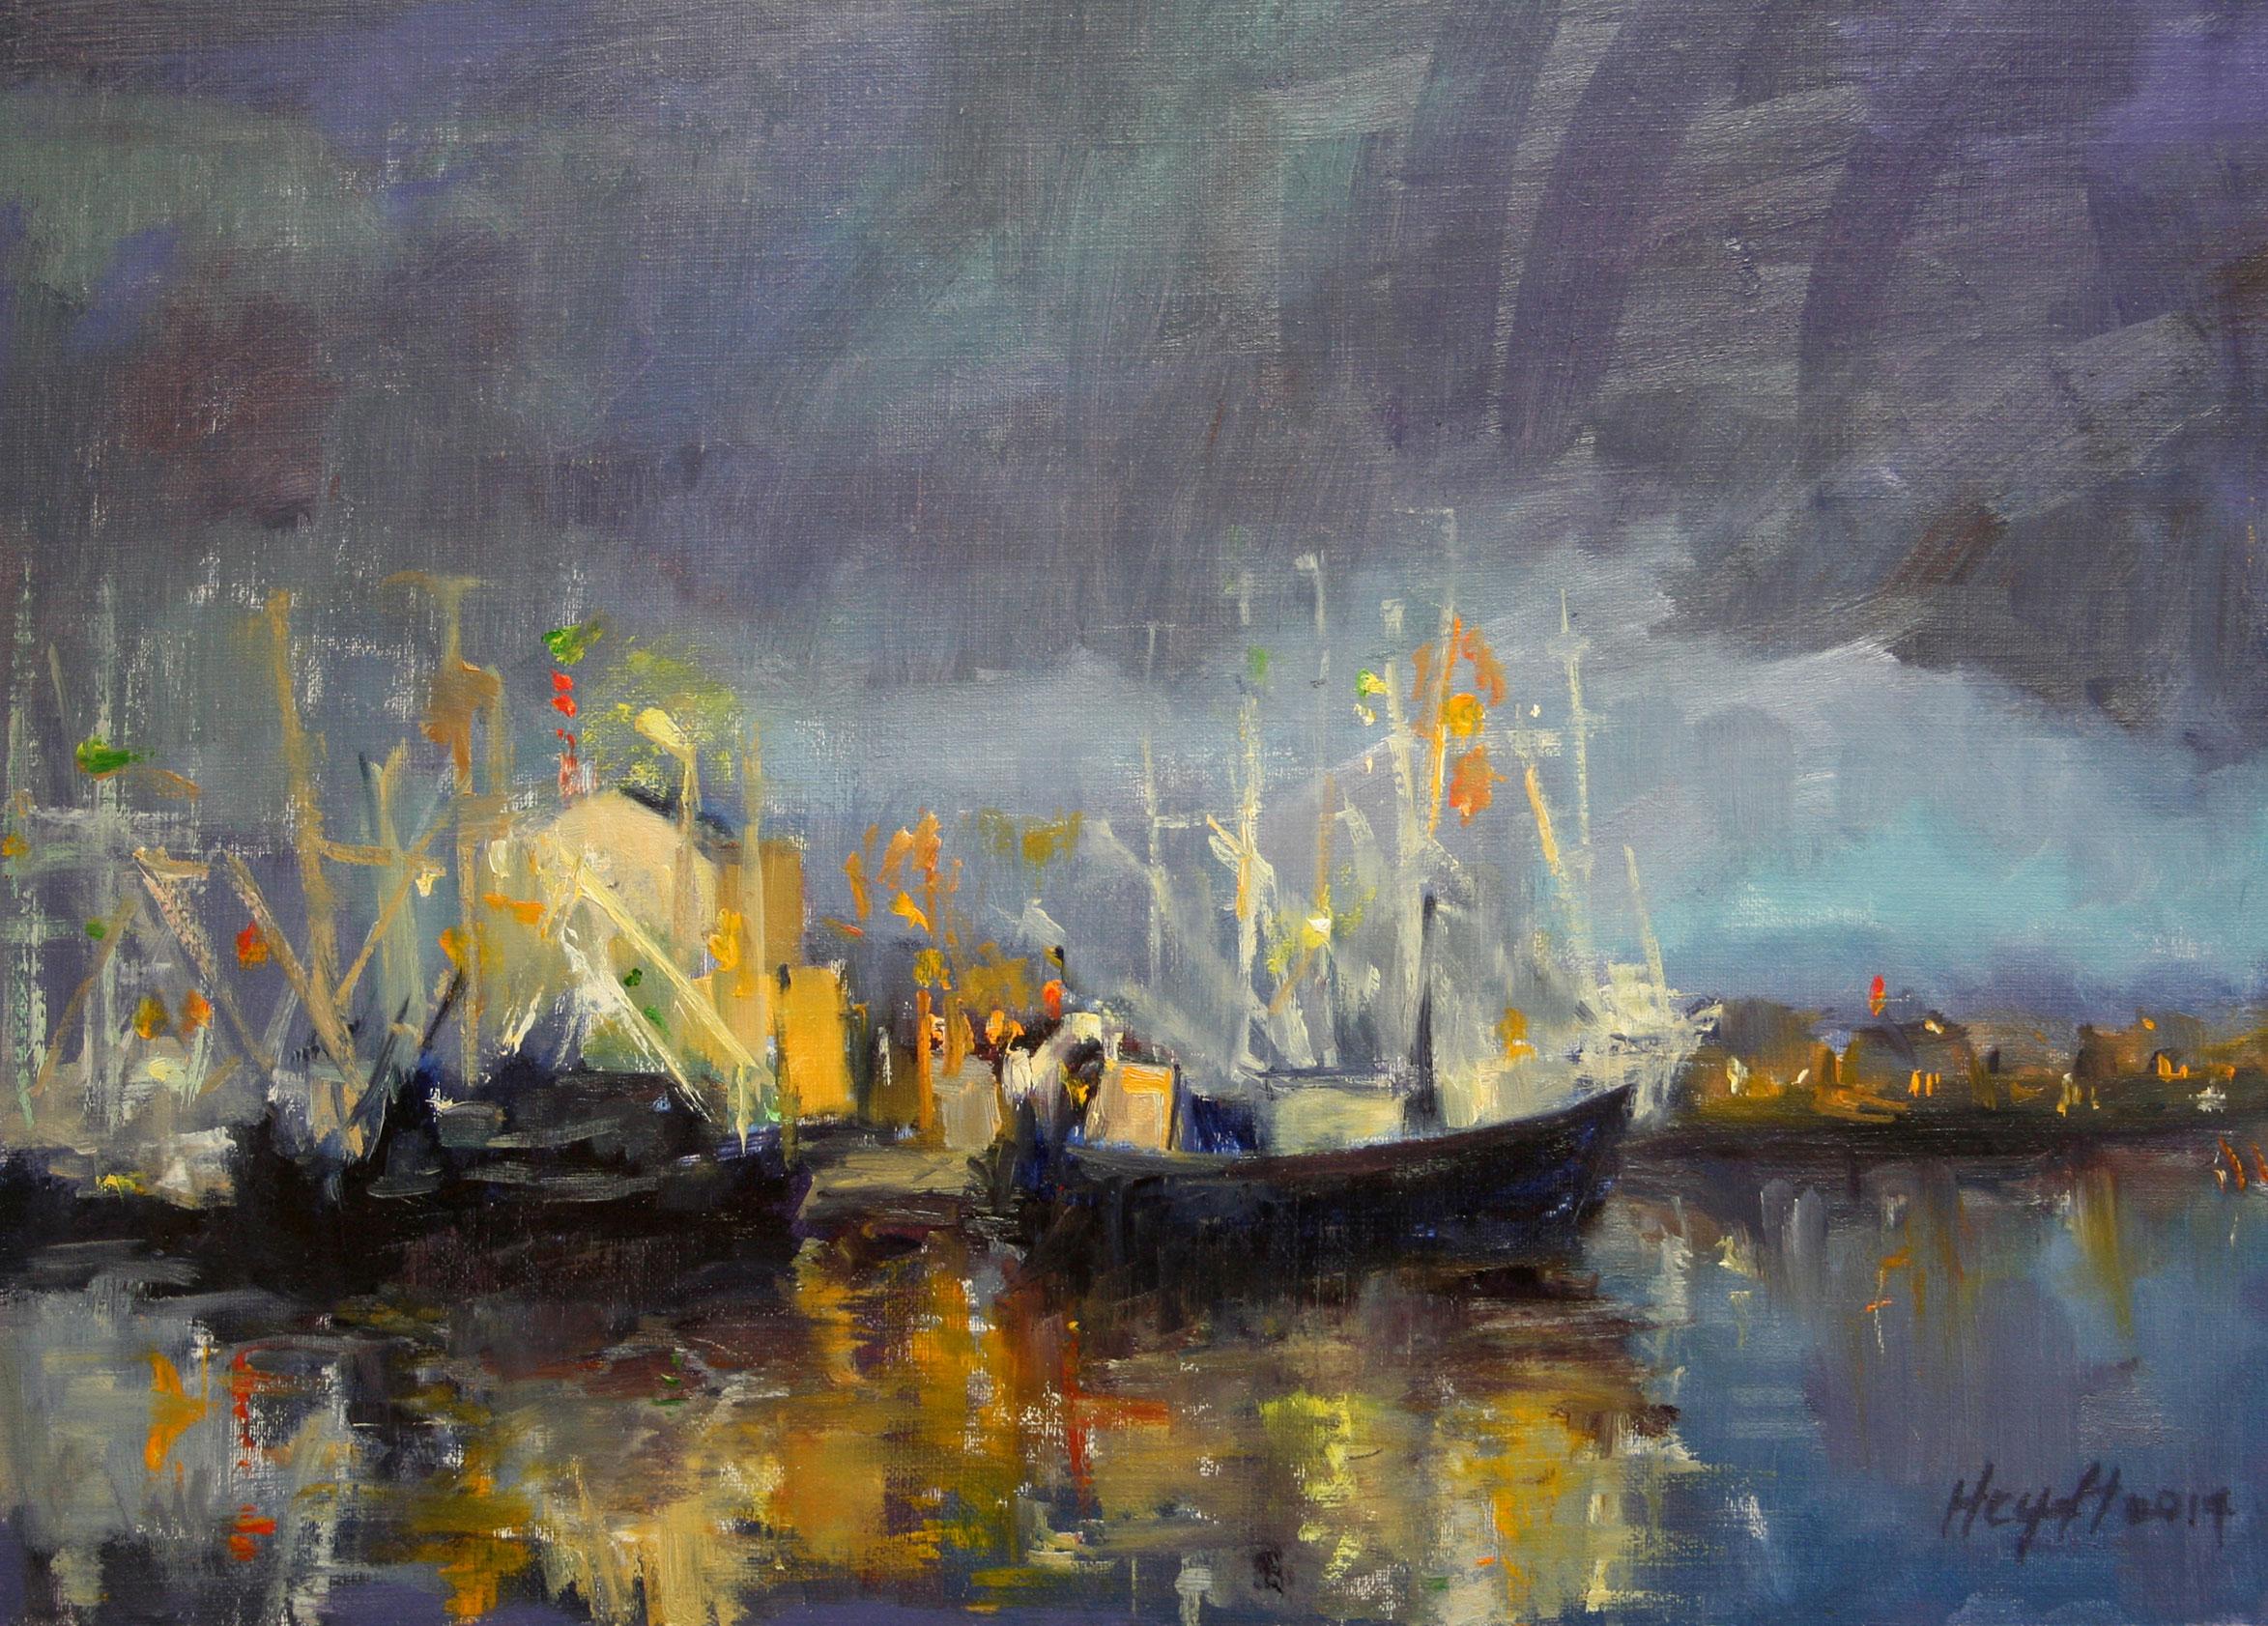 Gerry Heydt, Fishing Fleet, Cape May